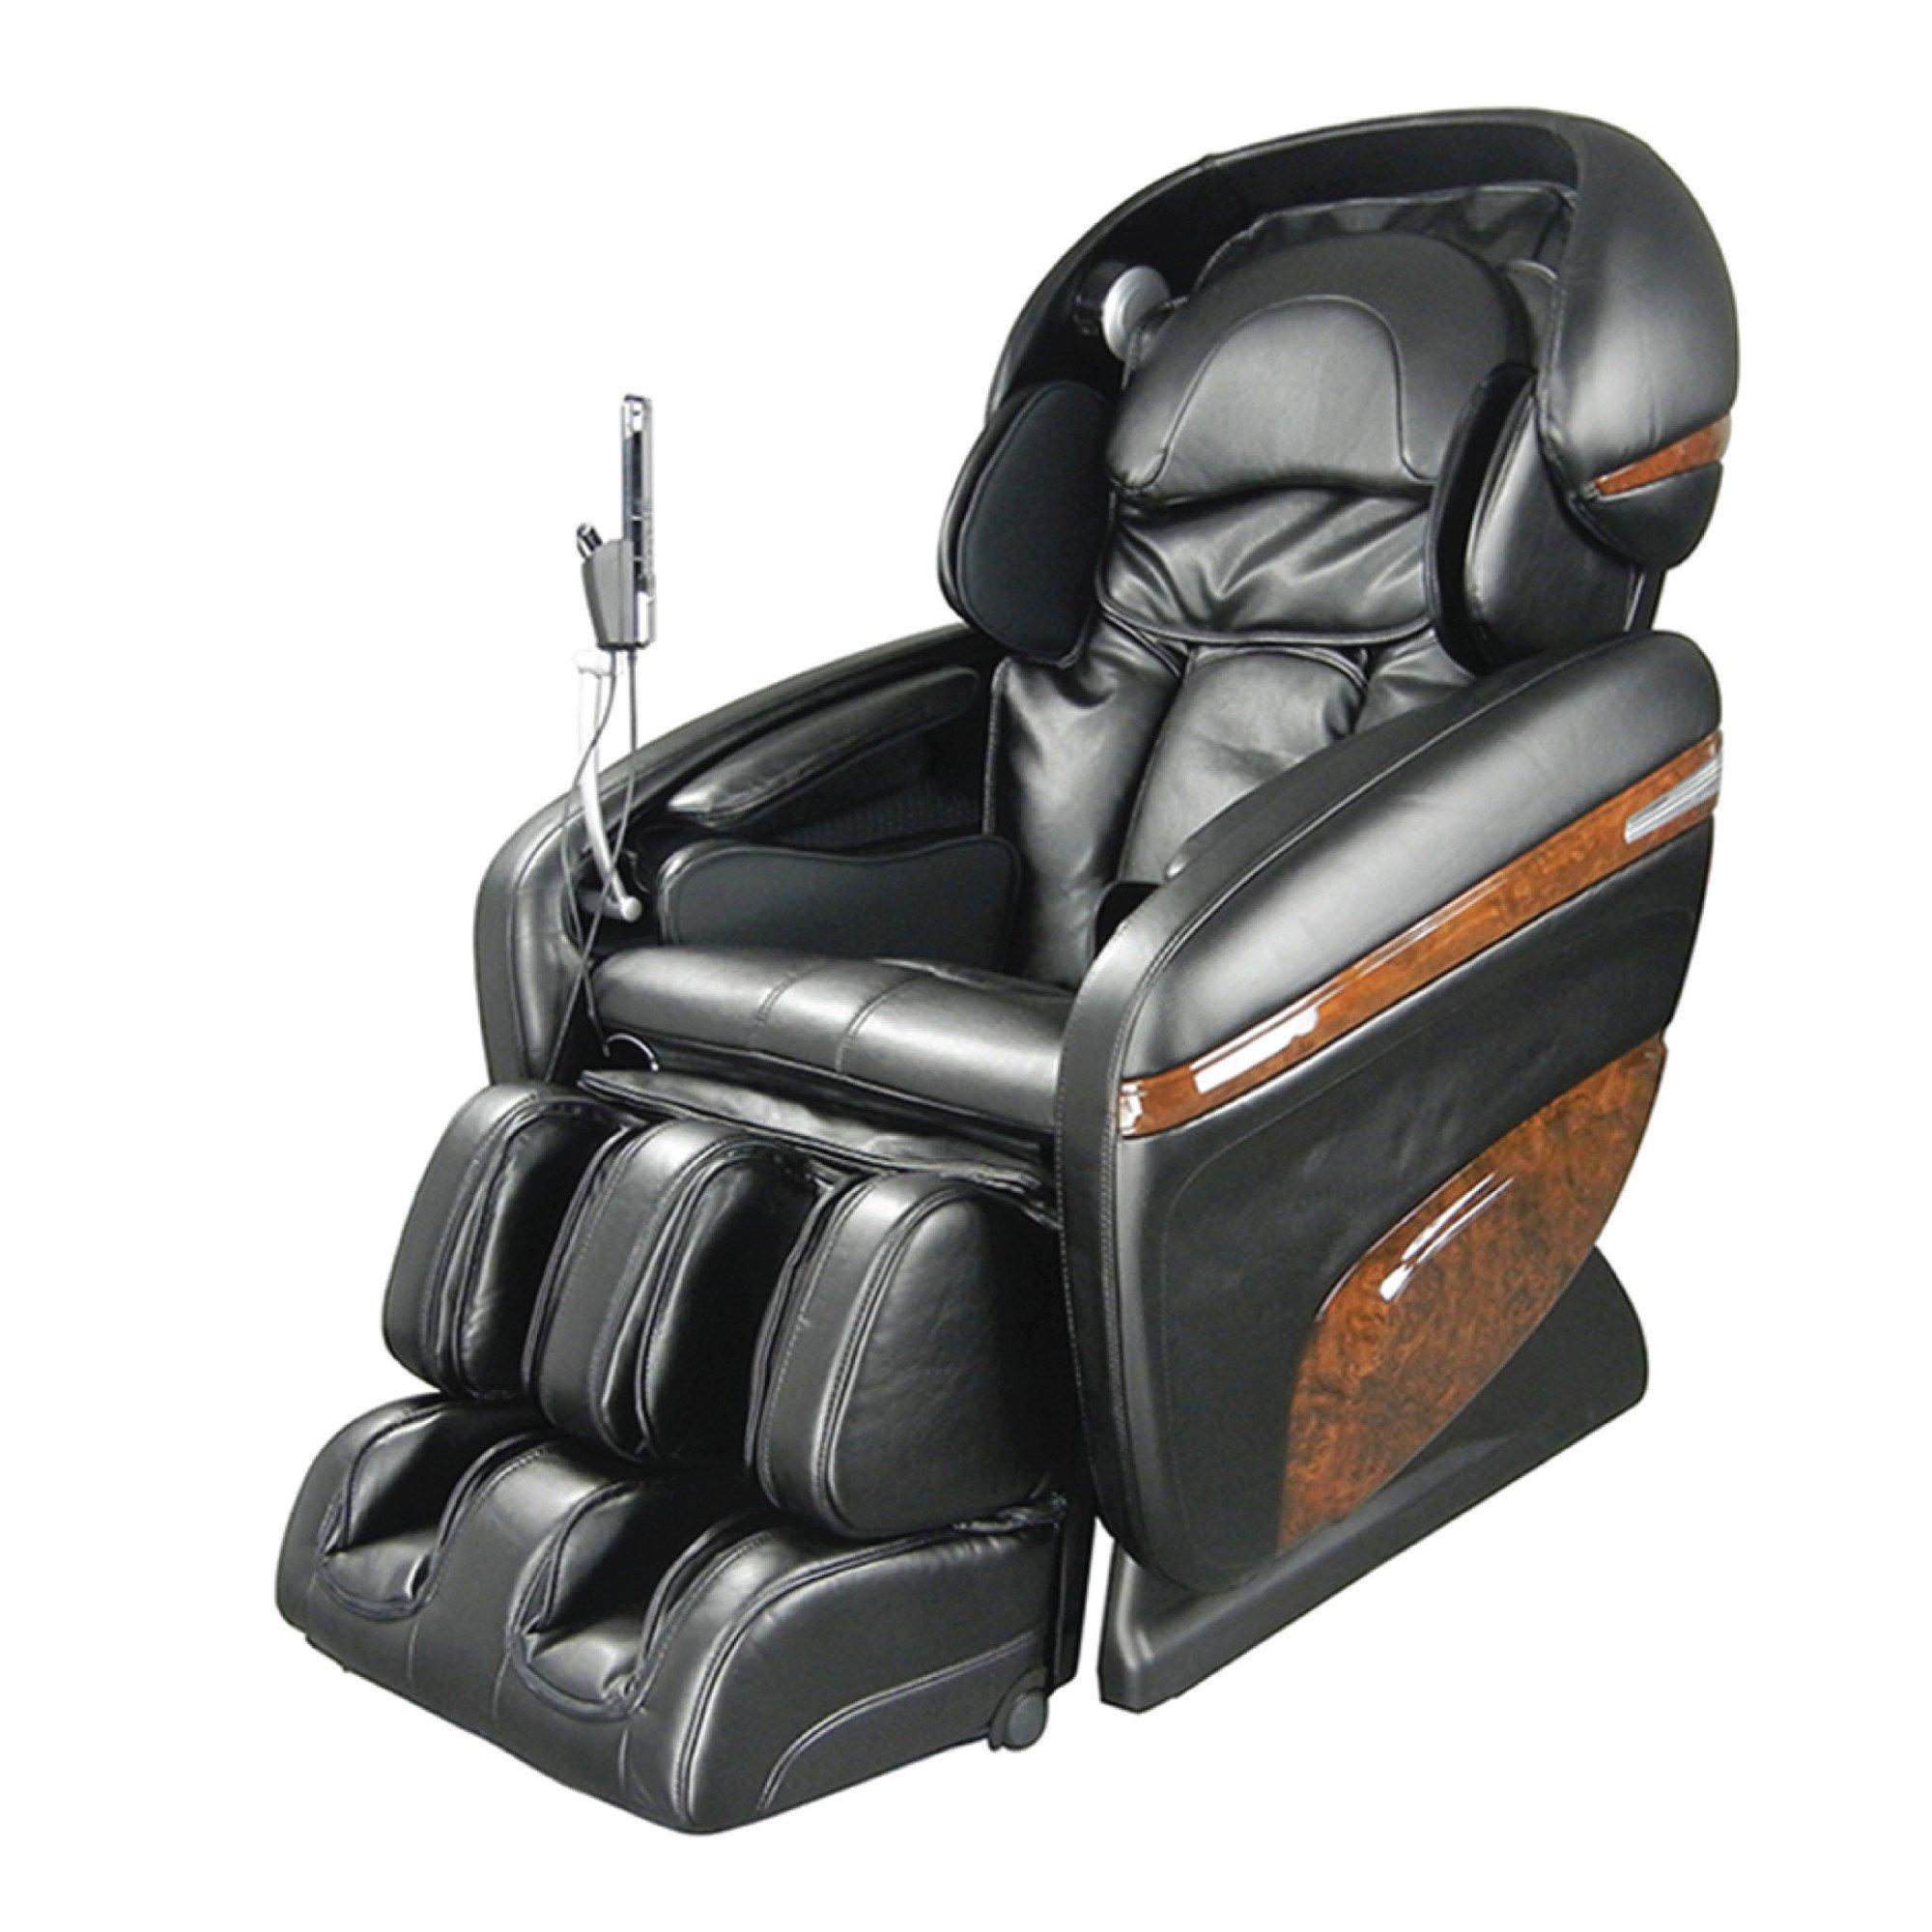 Osaki 3D Pro Dreamer Massage Chair - Black - Front Angle View